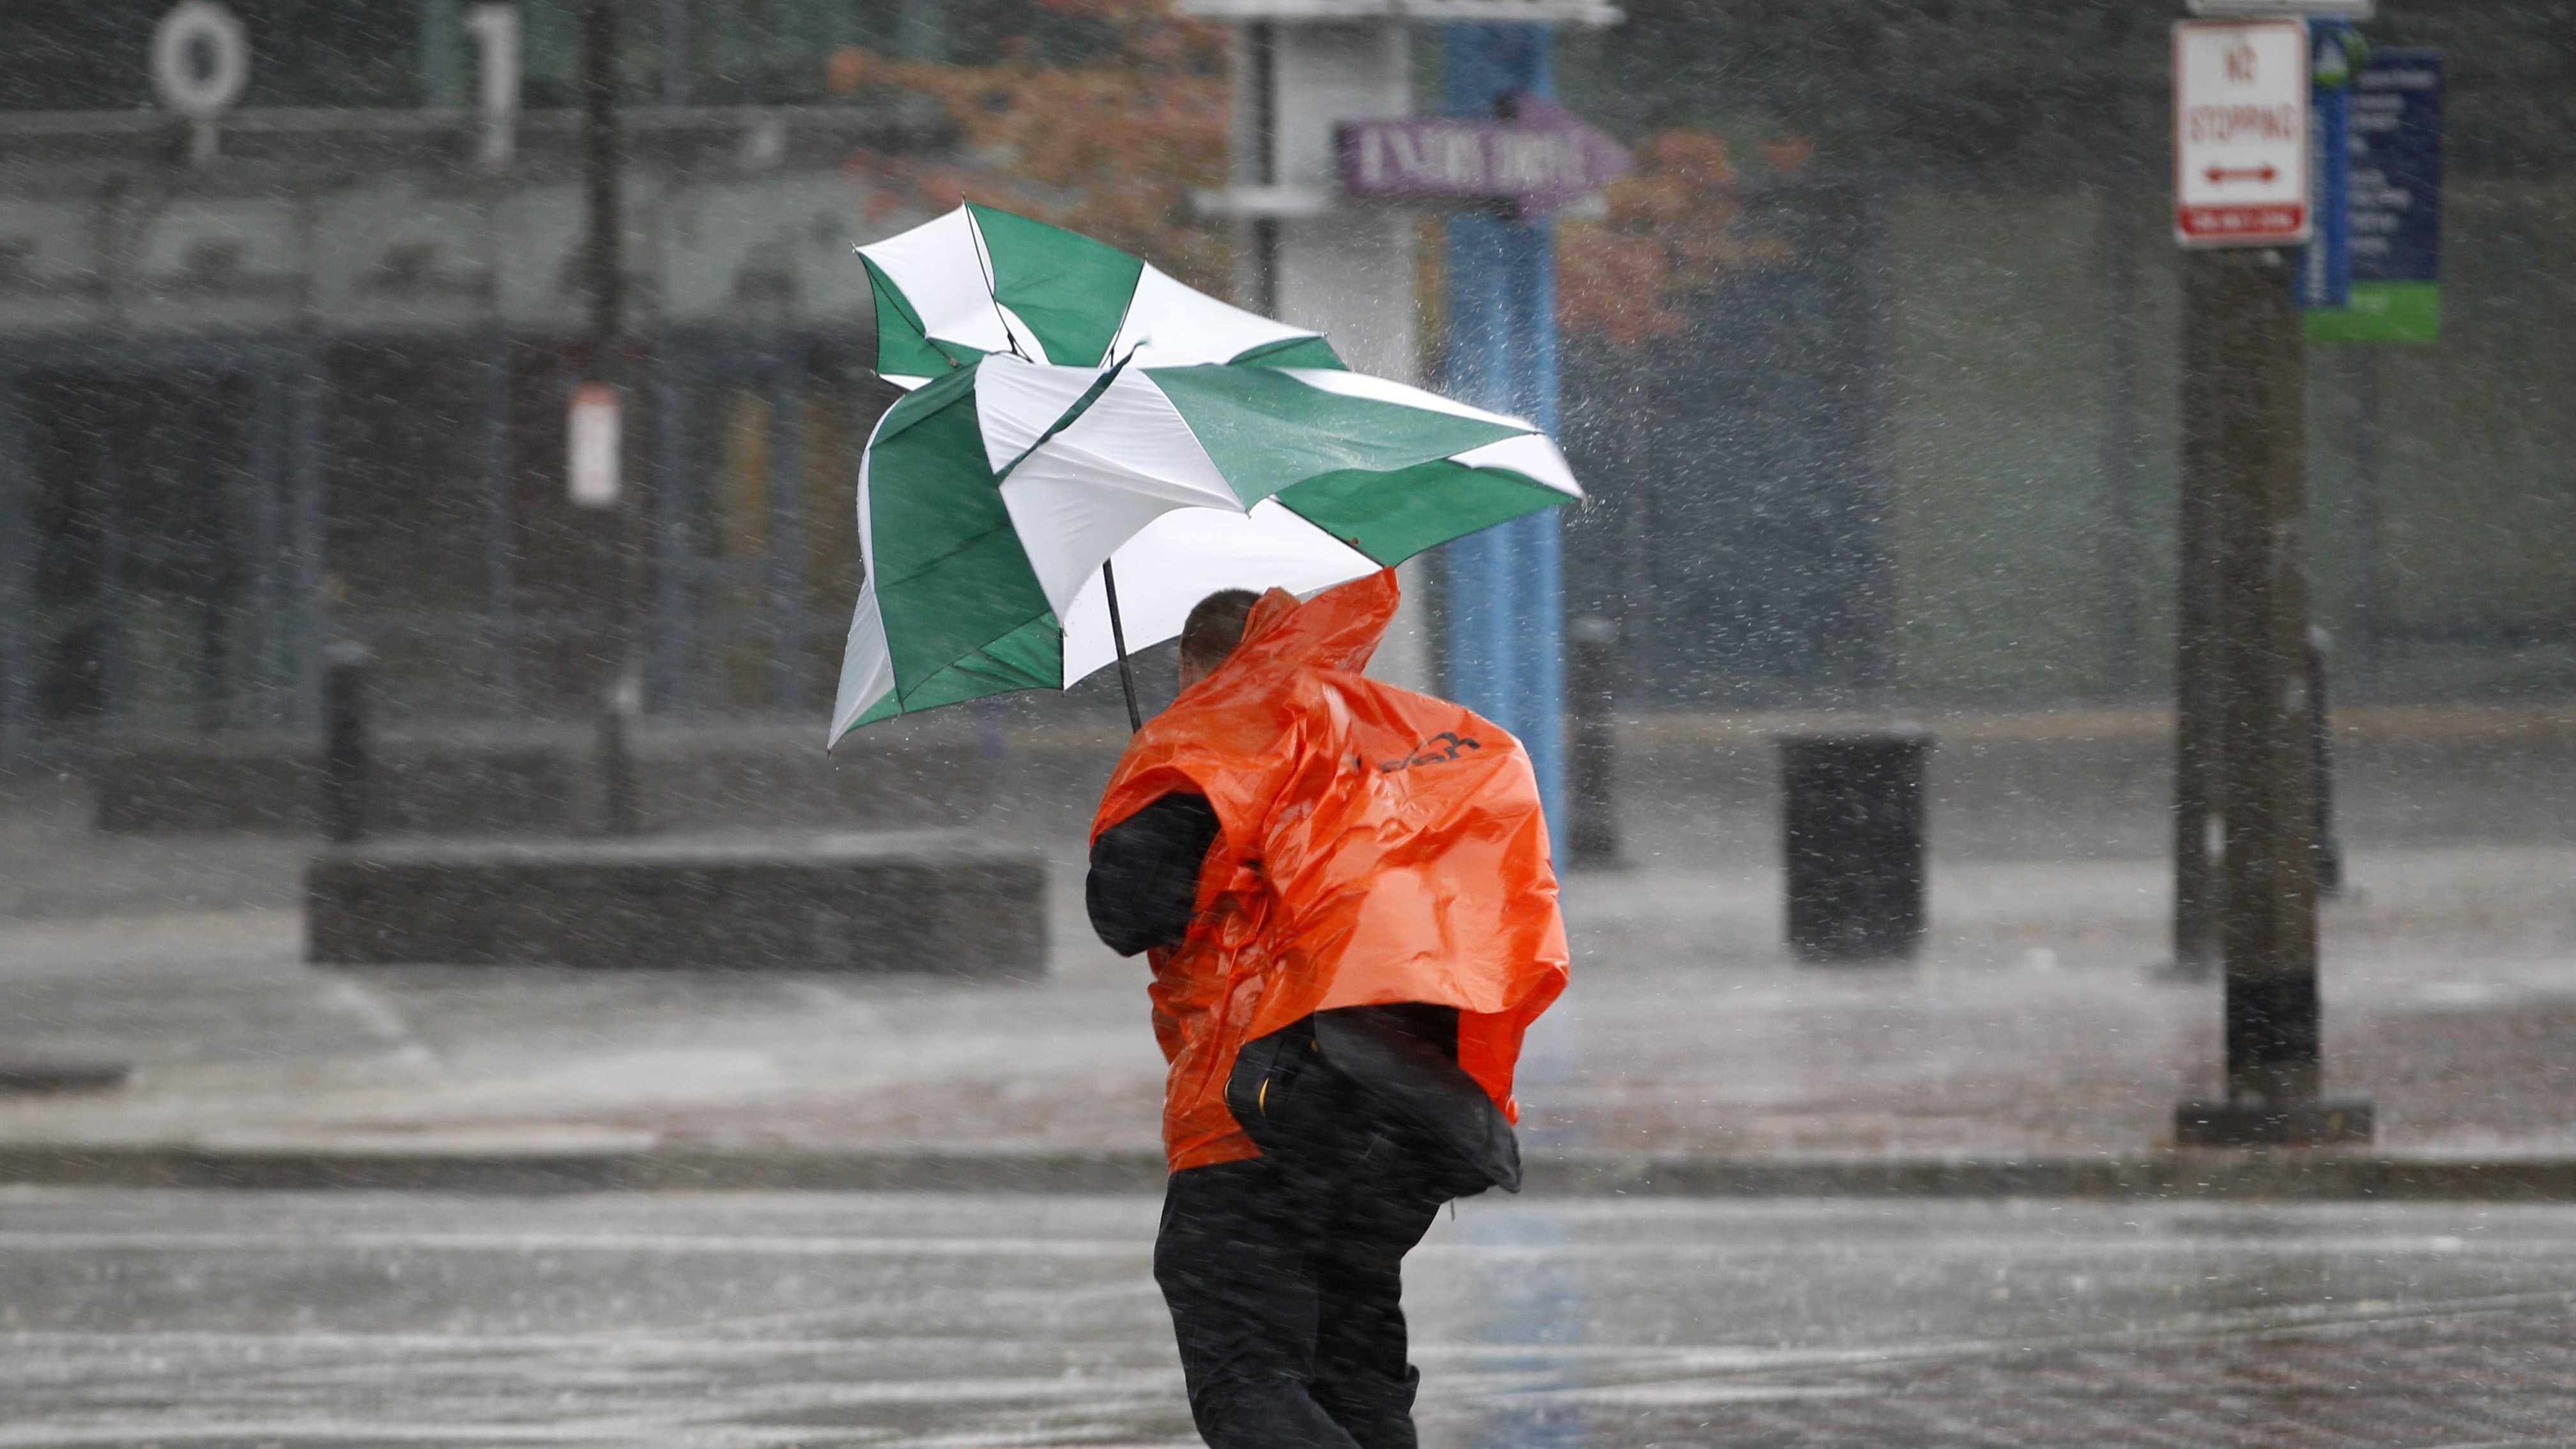 Rain, Umbrella